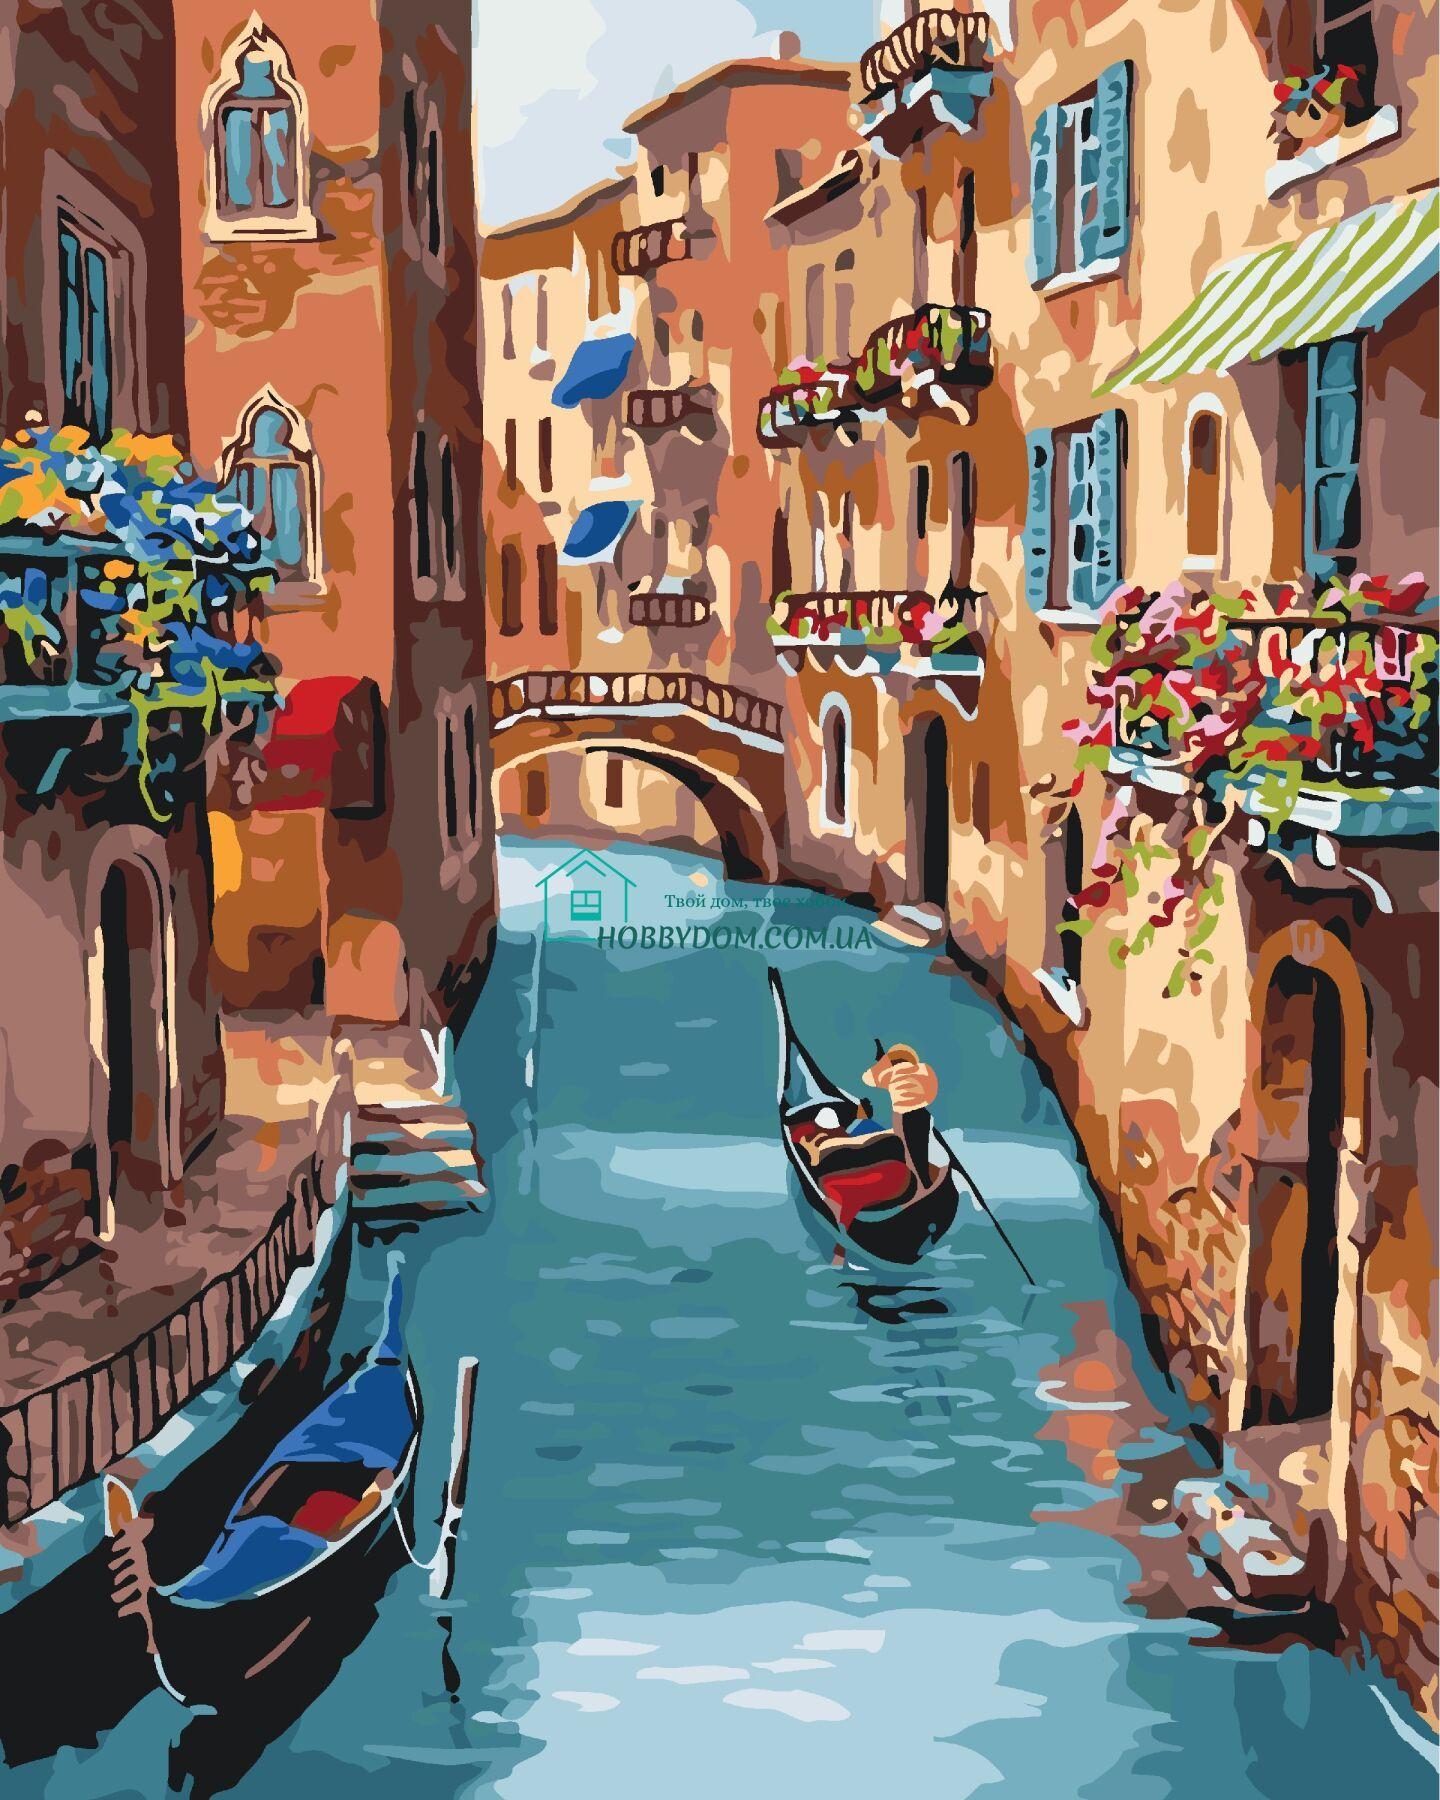 КНО2153 Раскраска по номерам Солнечная Венеция ТМ Идейка ...